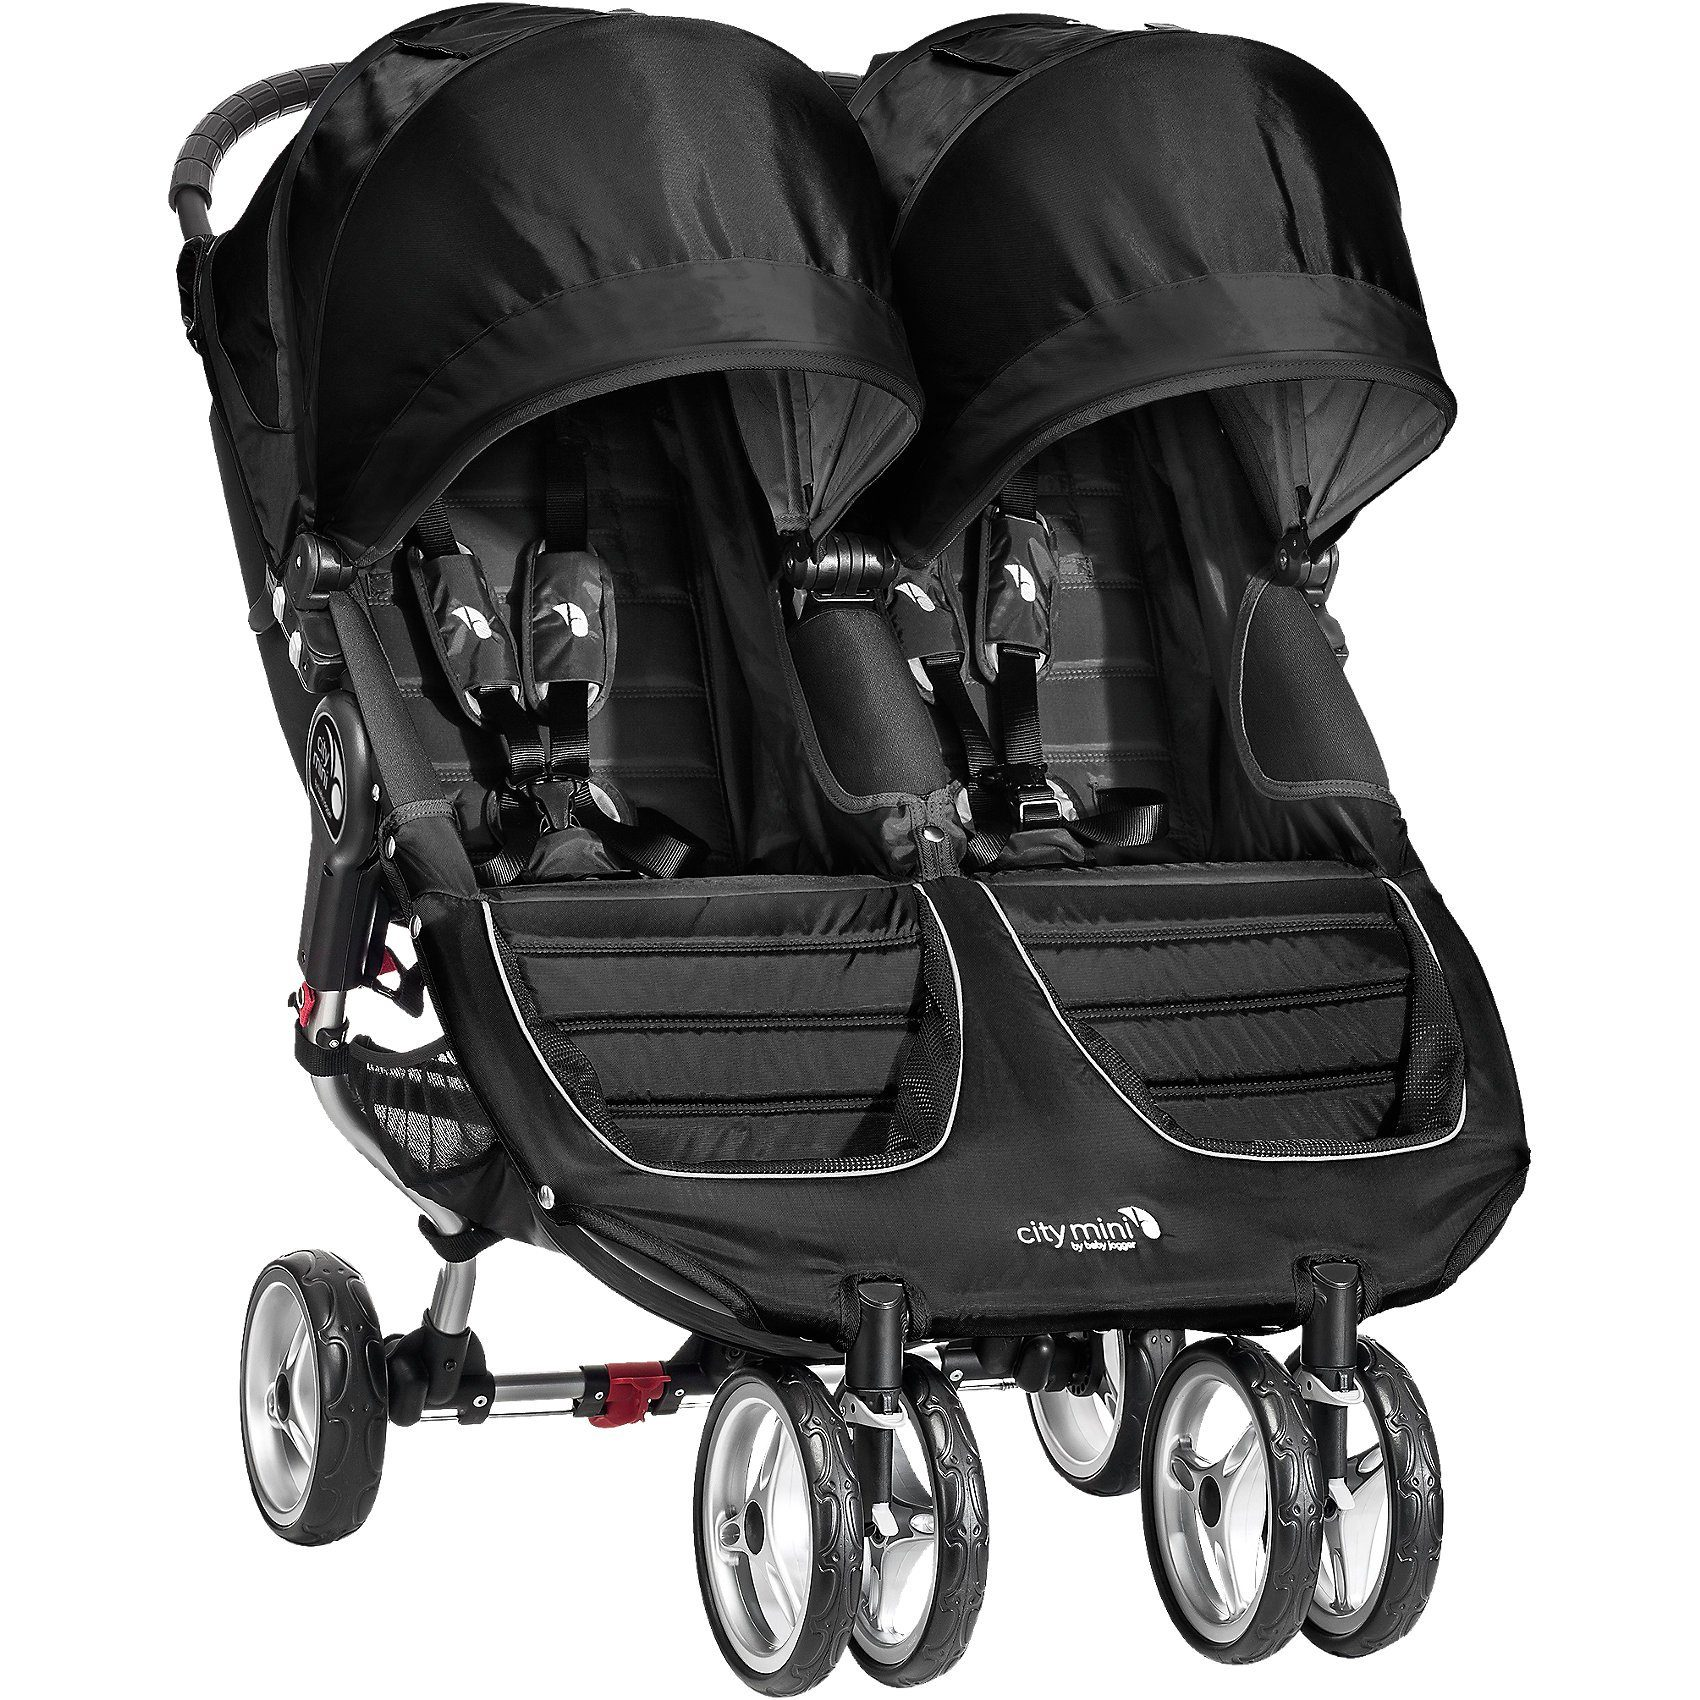 Baby Jogger Zwillings- und Geschwisterwagen City Mini Double, black/ bla